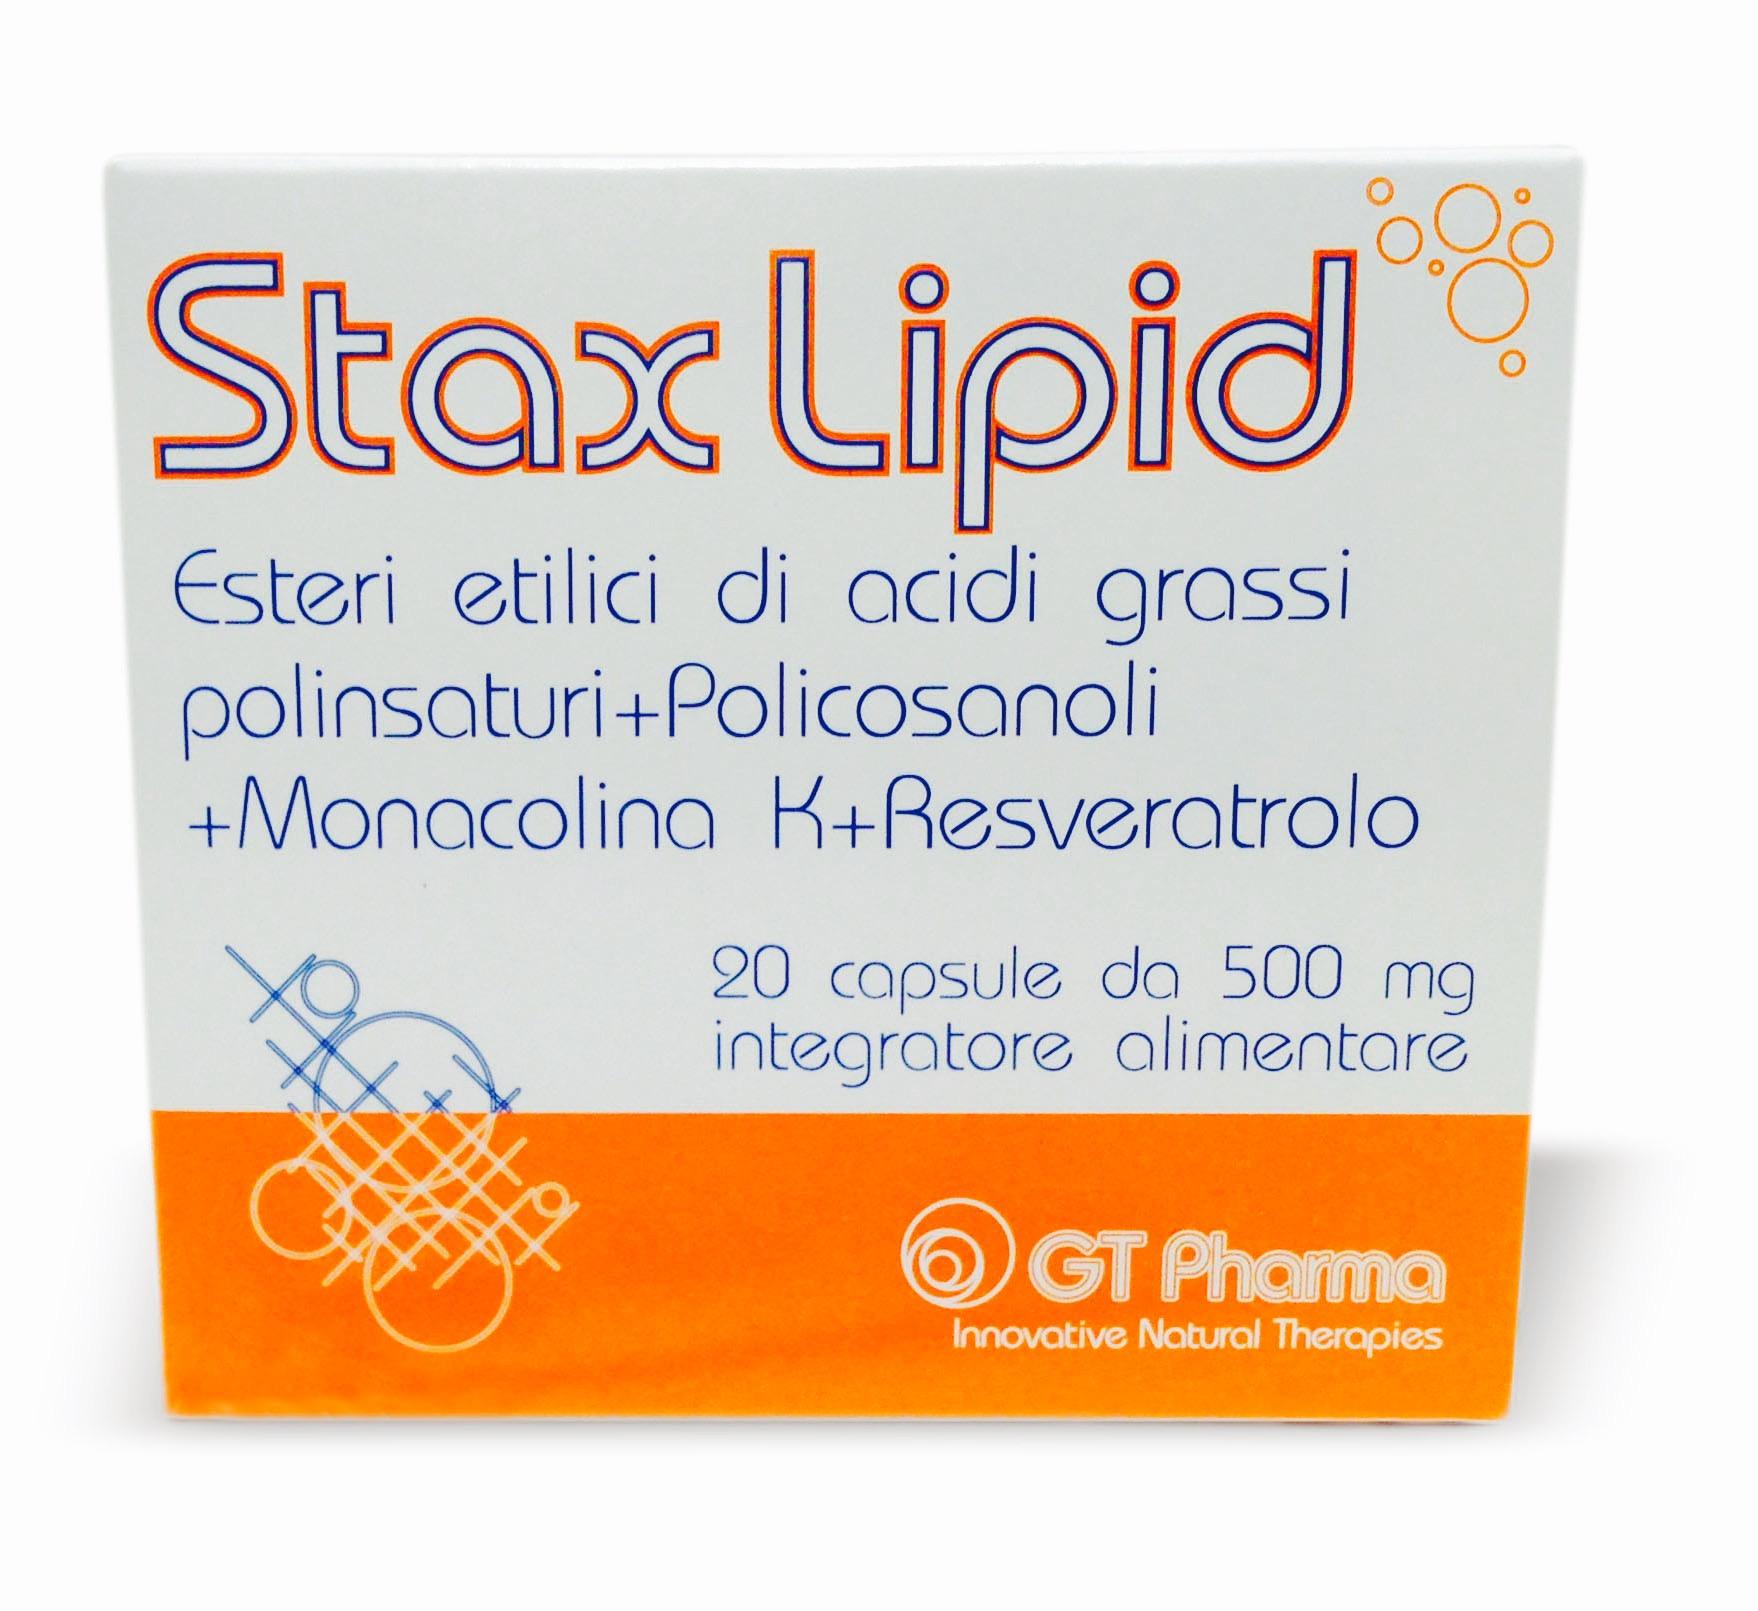 Stax Lipid 20 capsule da 500 mg